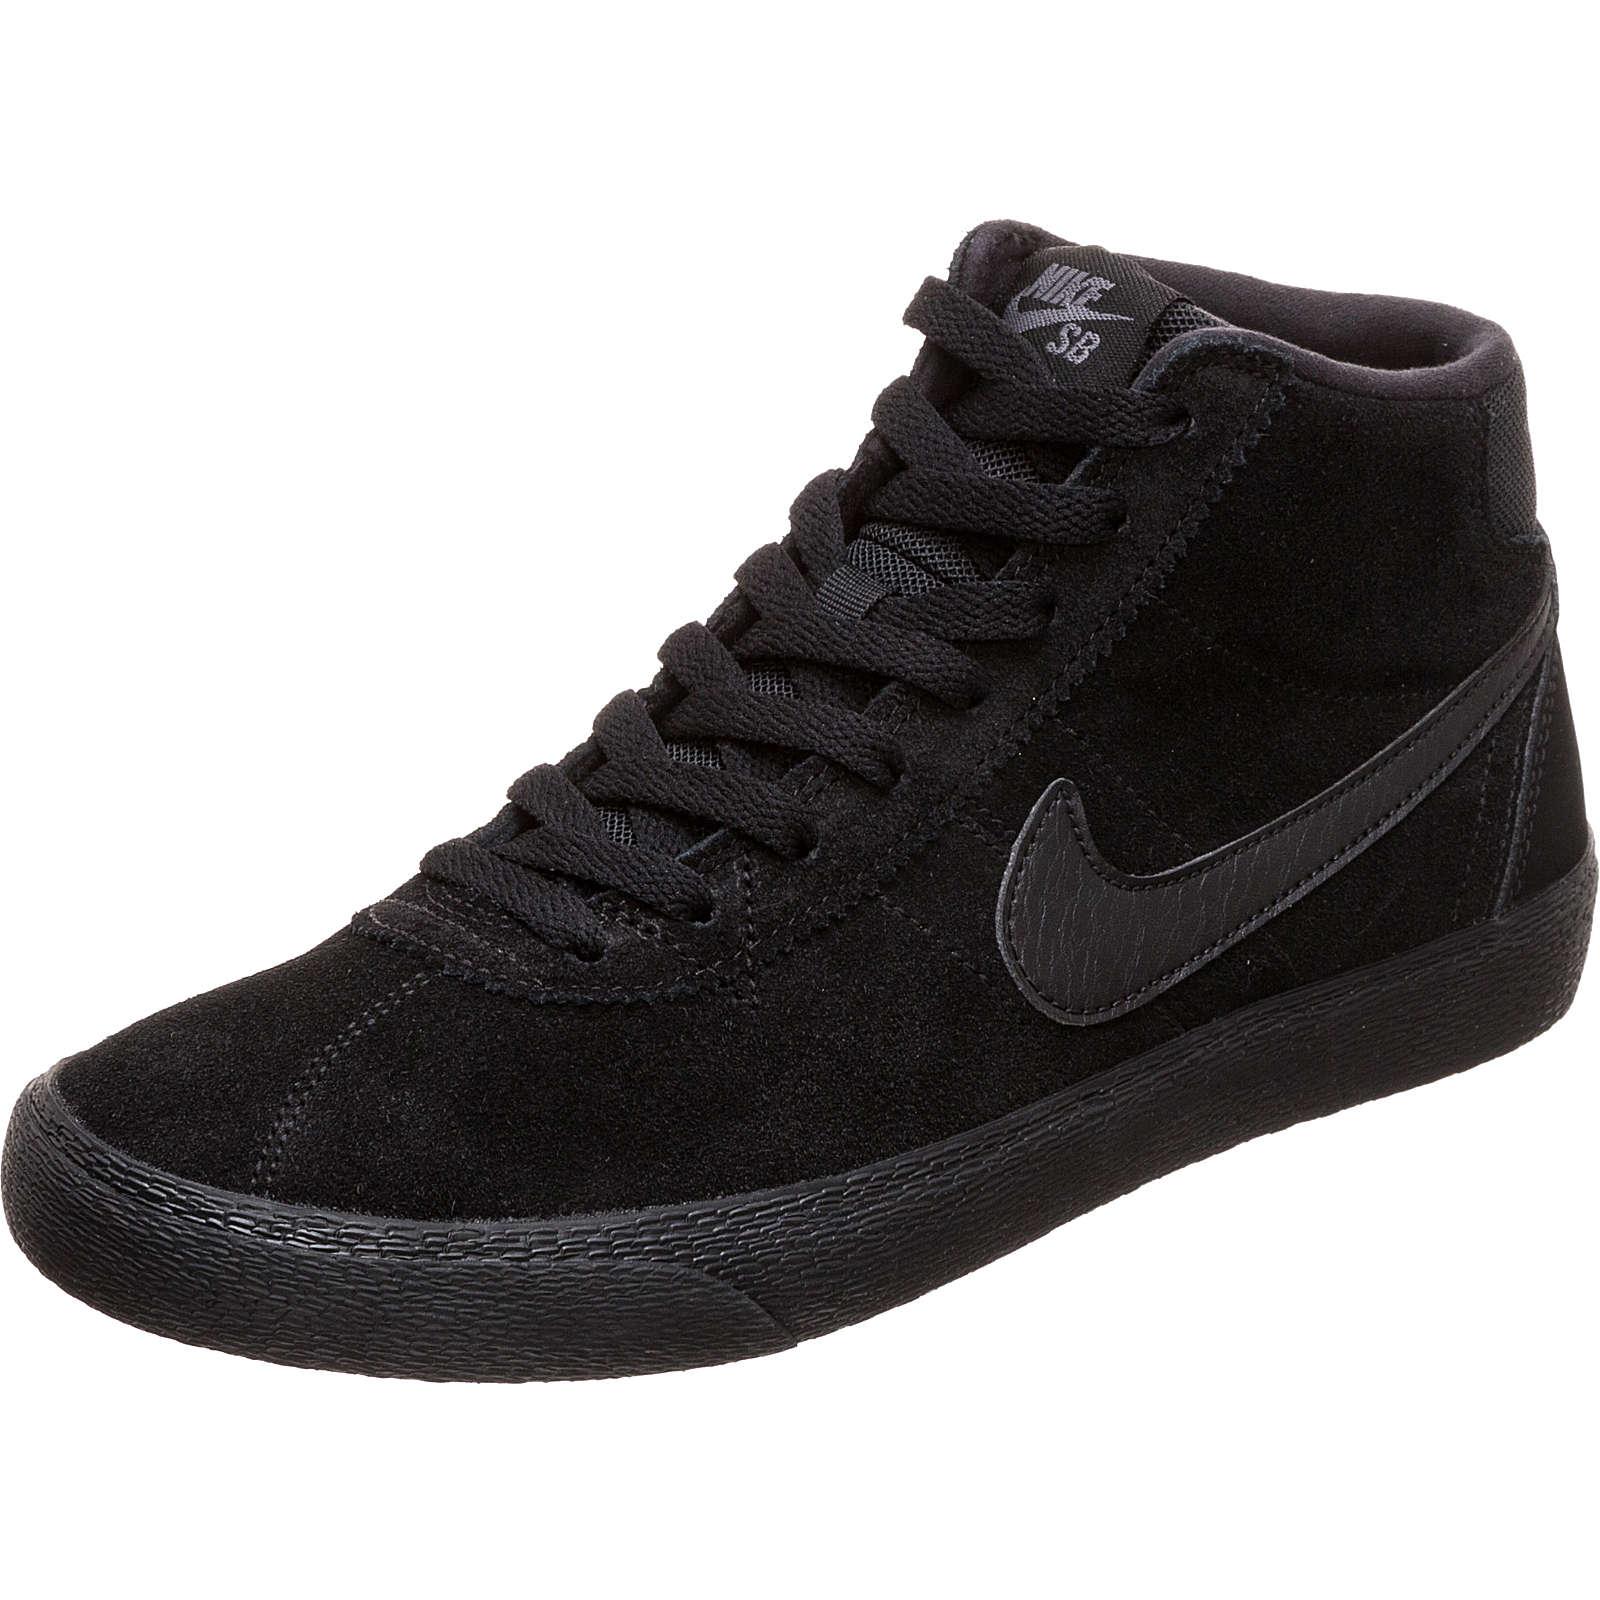 NIKE SB Bruin High Sneaker Damen schwarz Damen Gr. 44,5